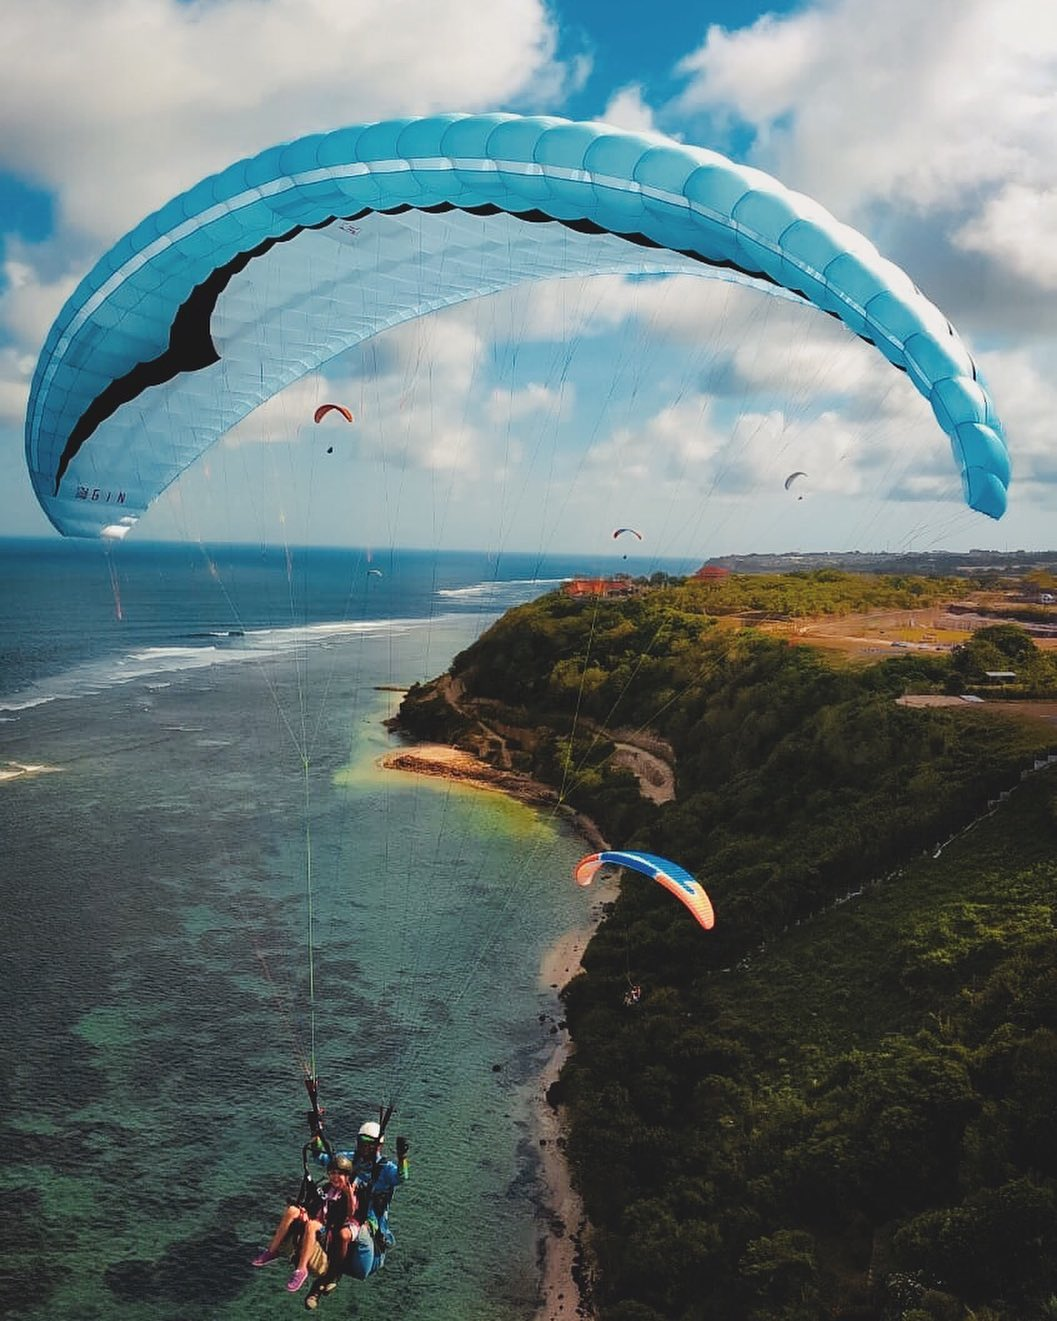 Bali Paragliding - IG @timbisparaglidingbali